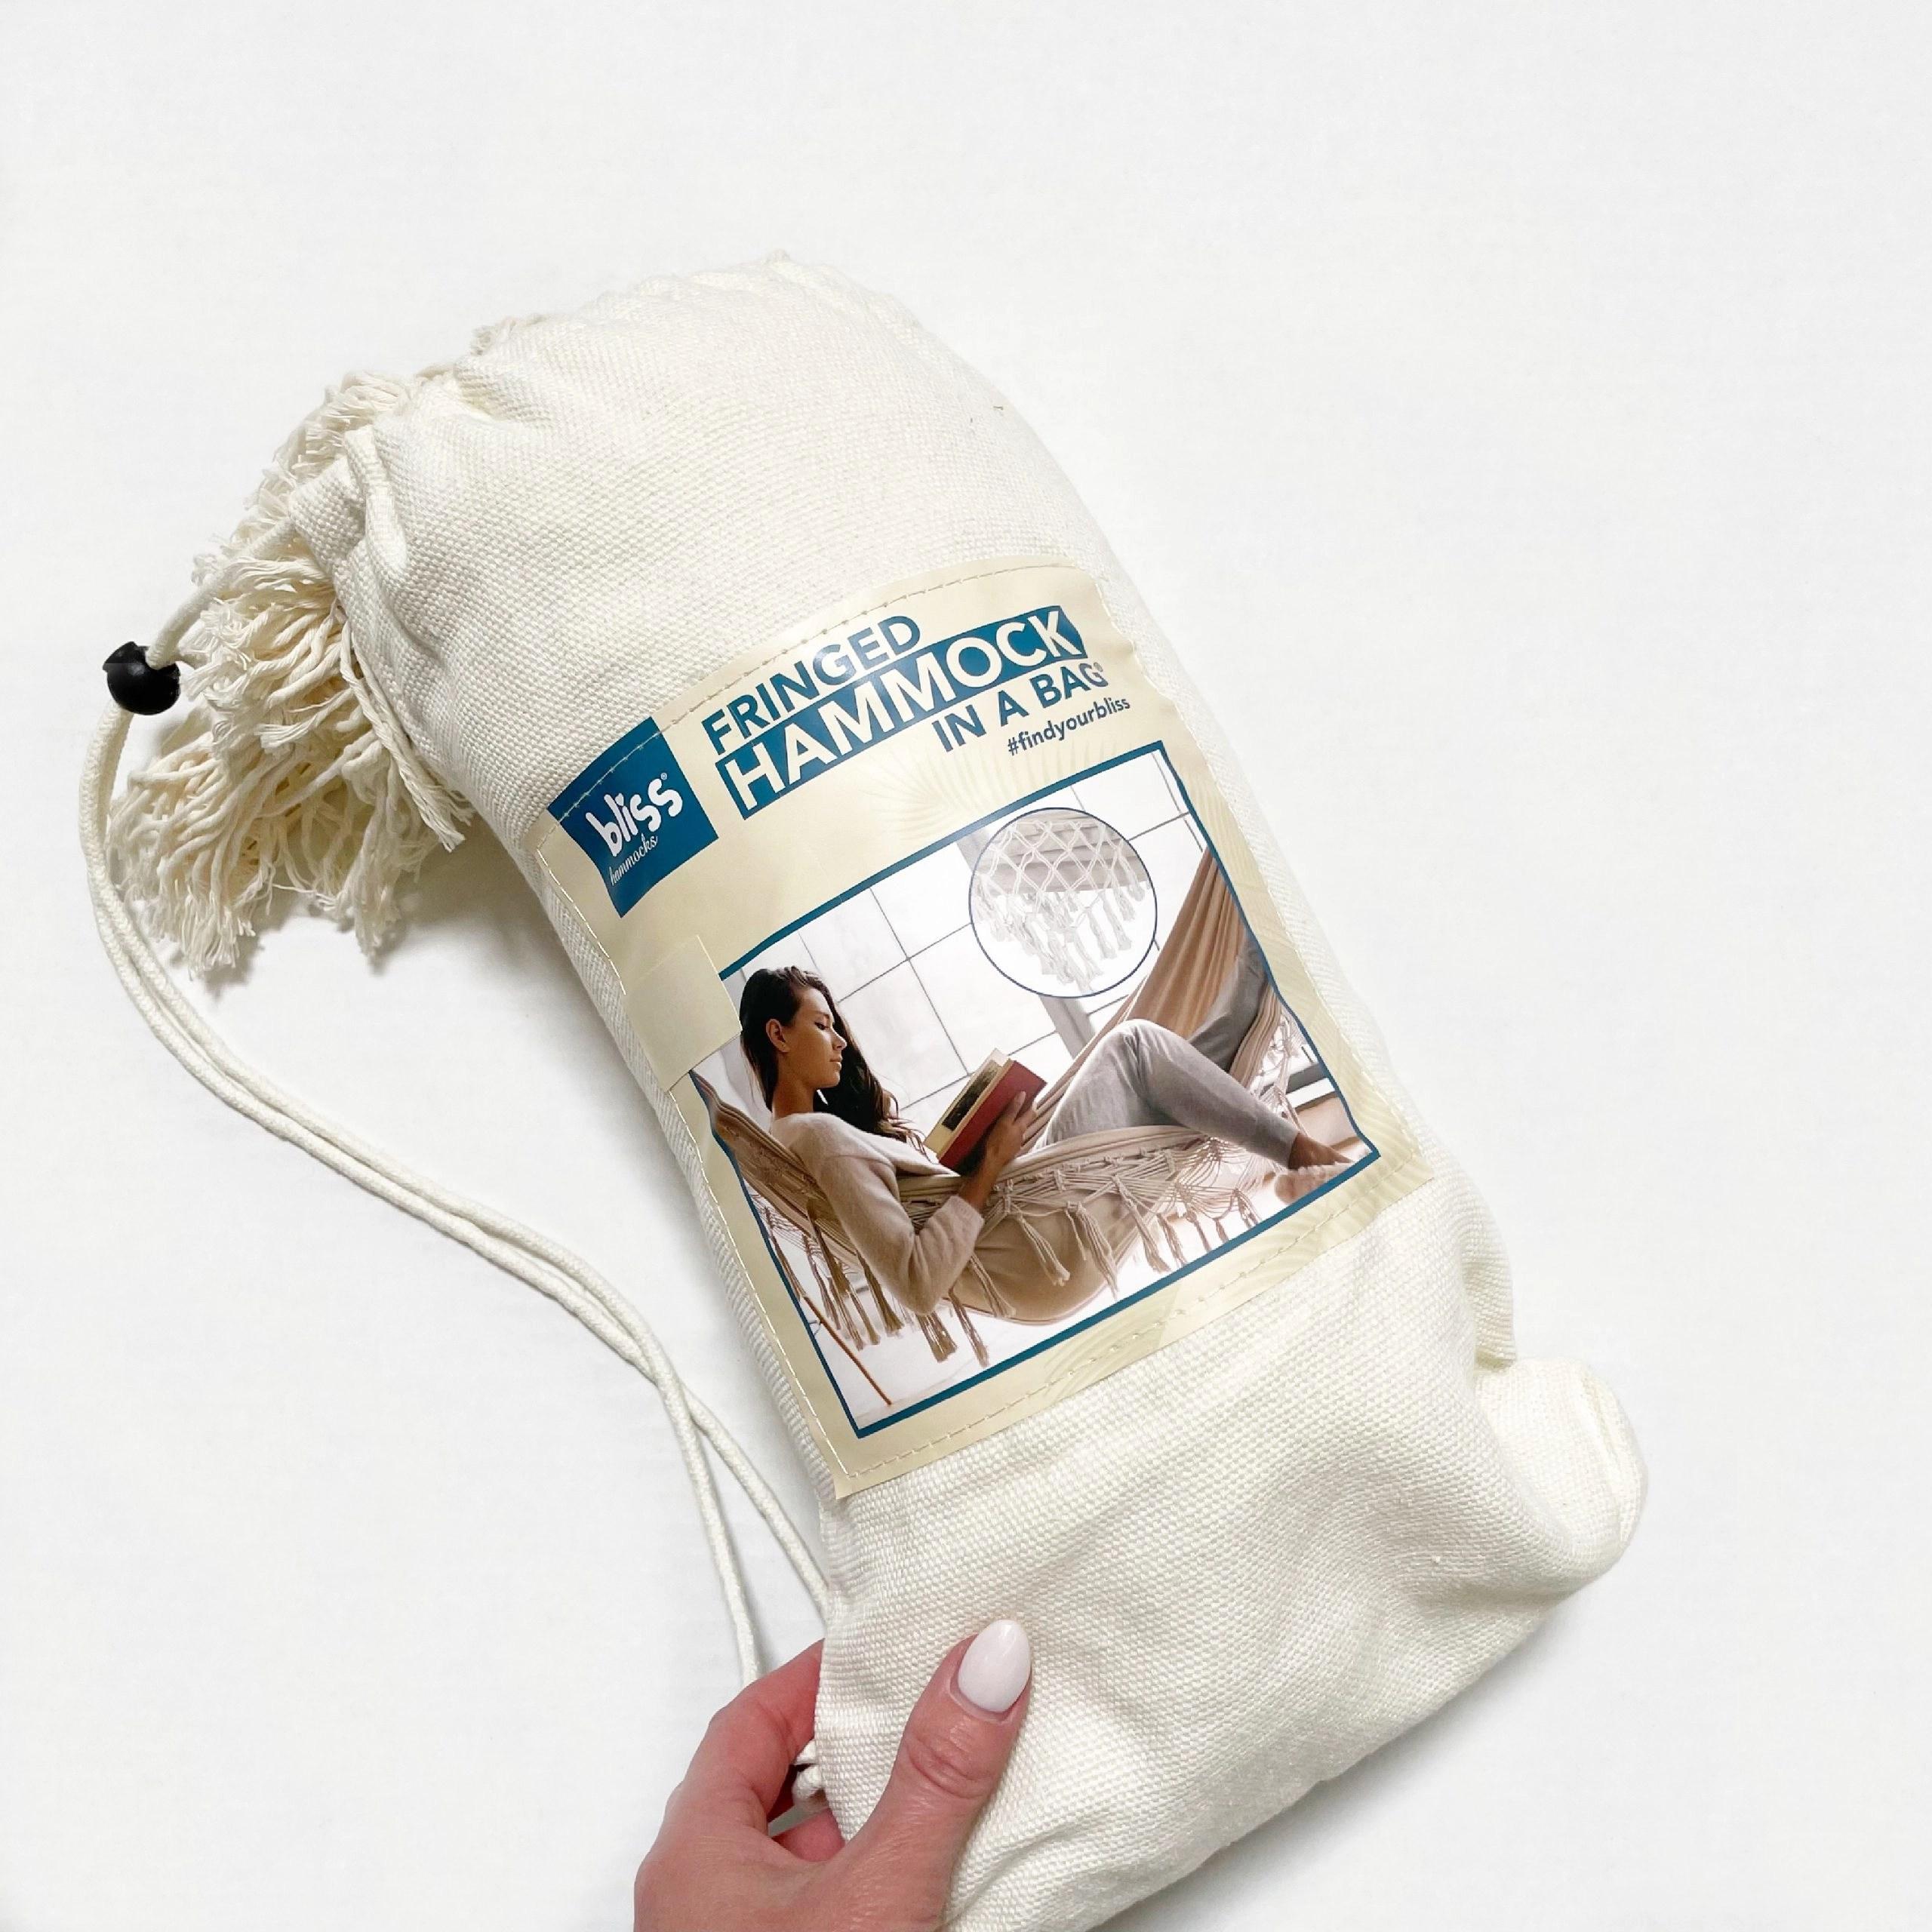 Bliss Hammocks Hand-Braided Hammock in a Bag With Decorative Fringe